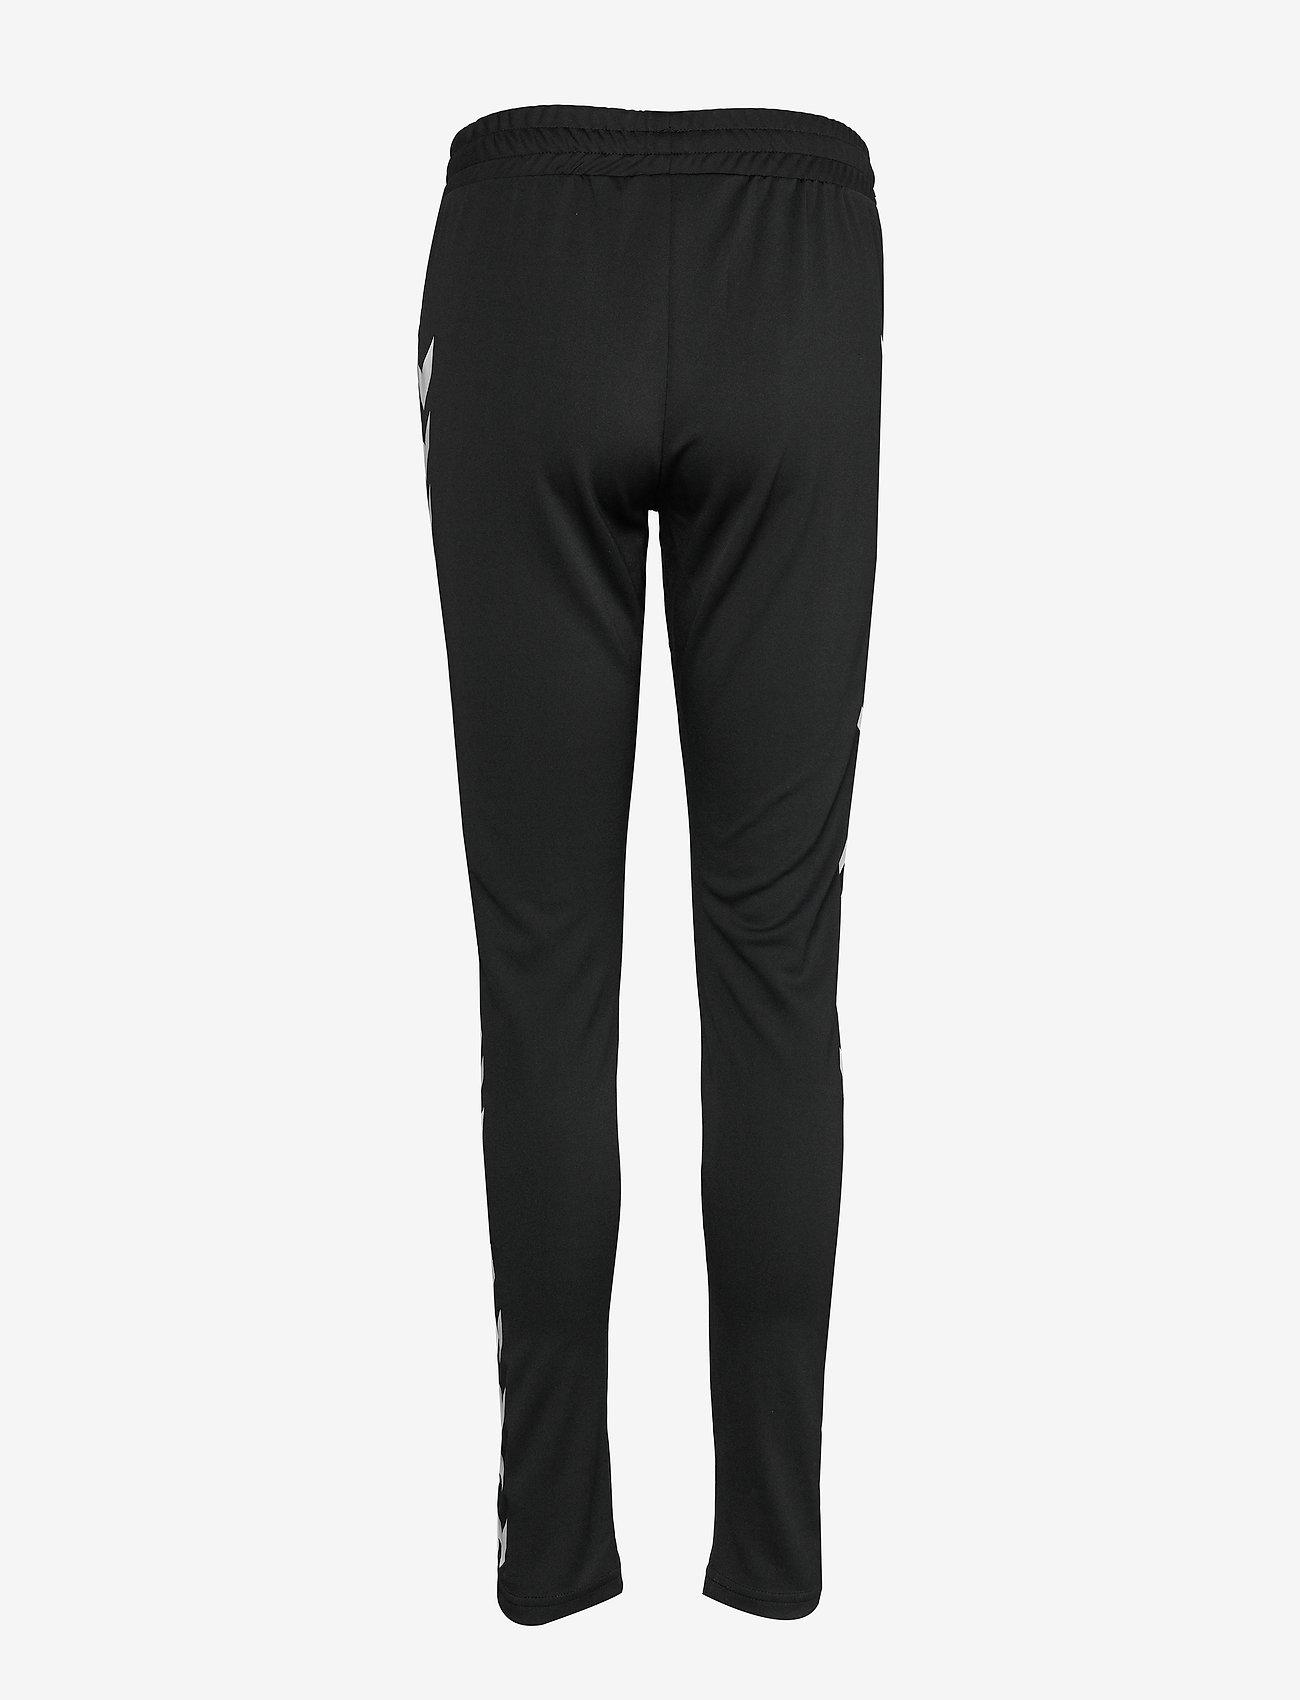 Hummel - hmlJINA SLIM PANTS - pants - black - 1